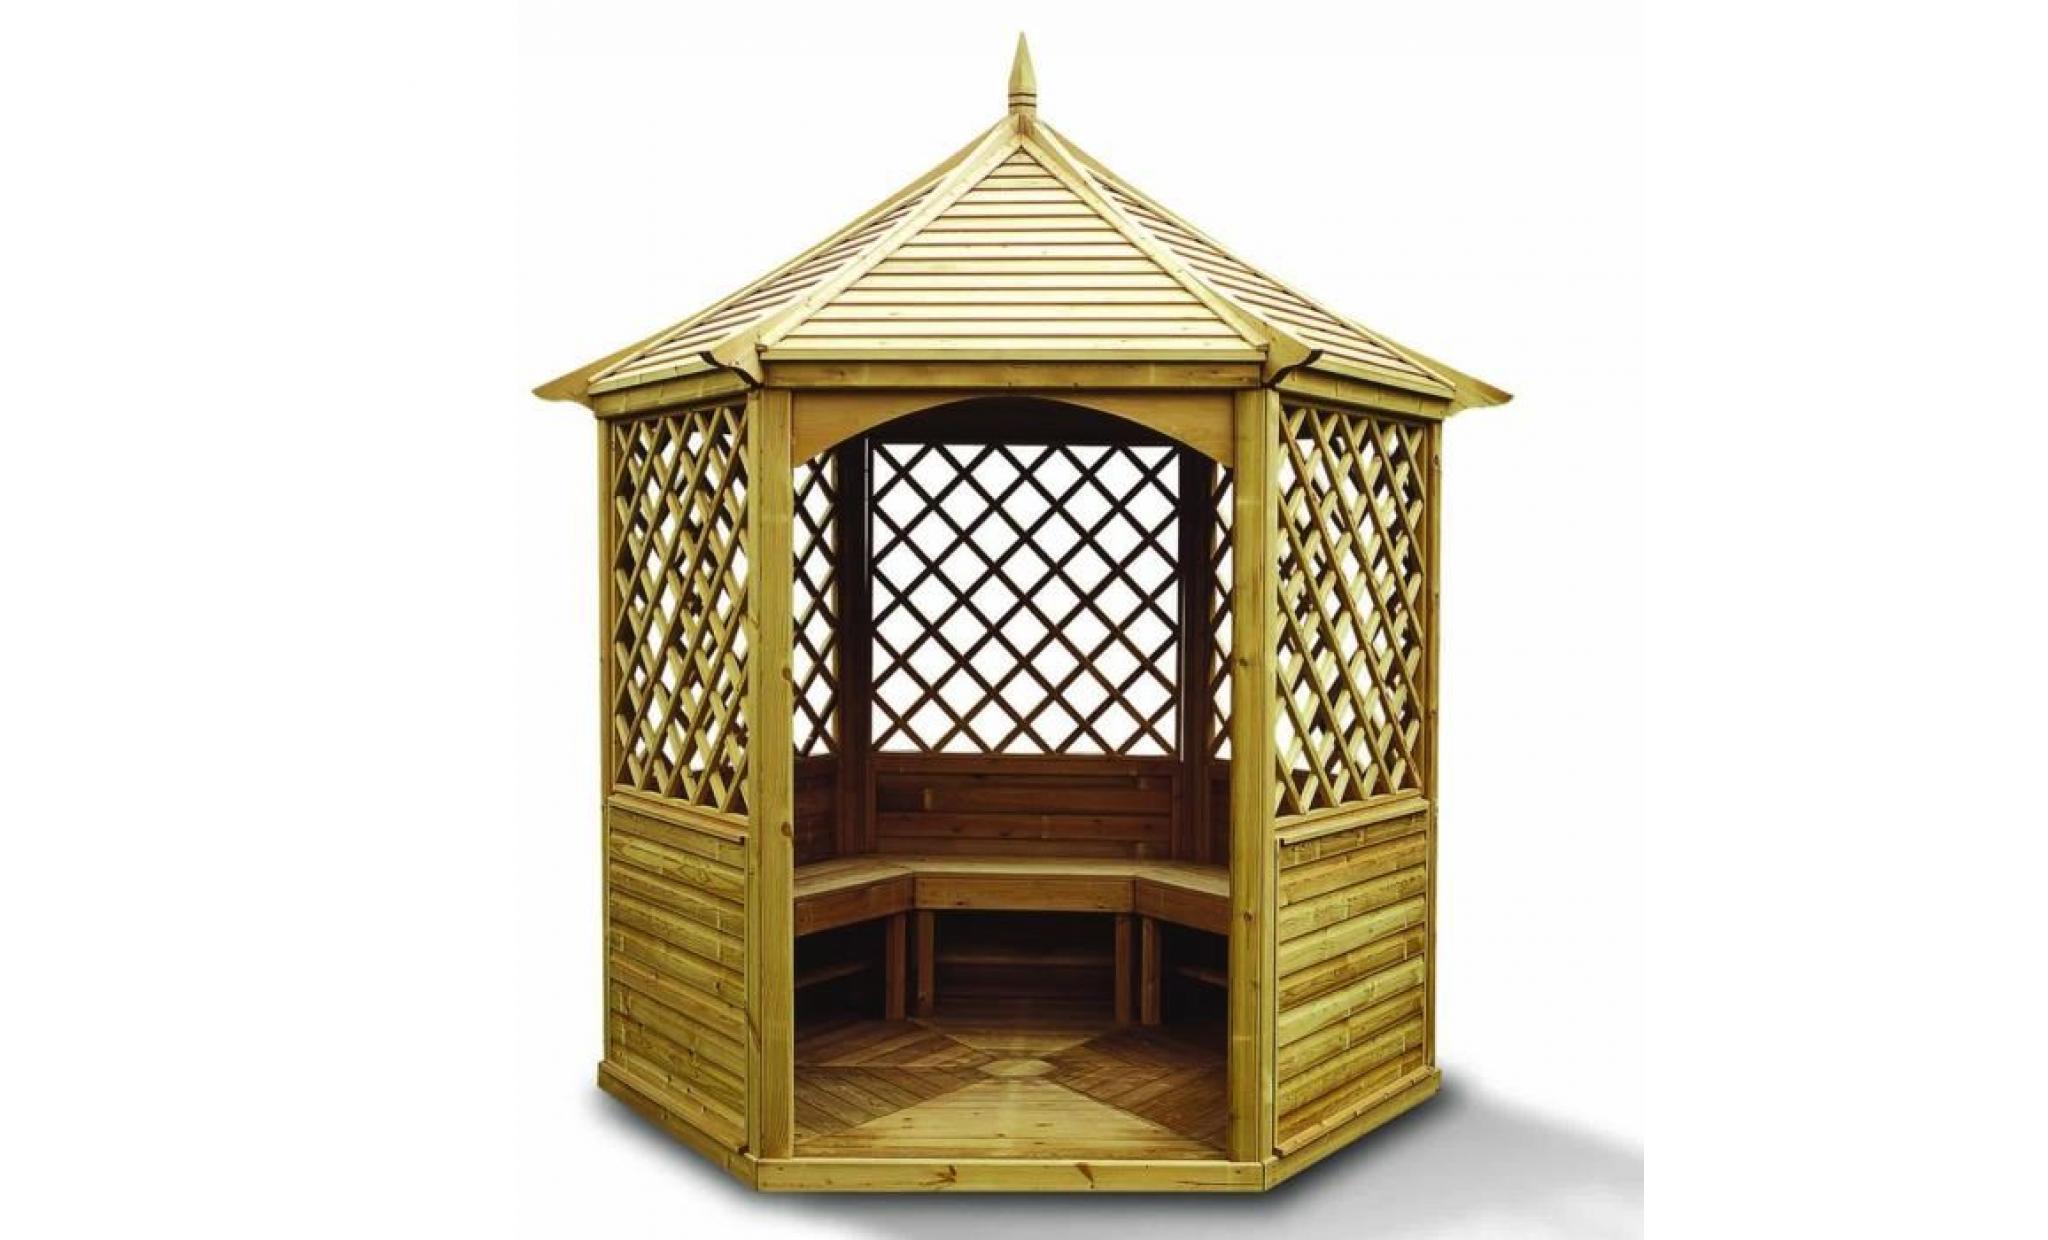 Kiosque Pavillon hexagonal 7,30m² - Toiture en bois